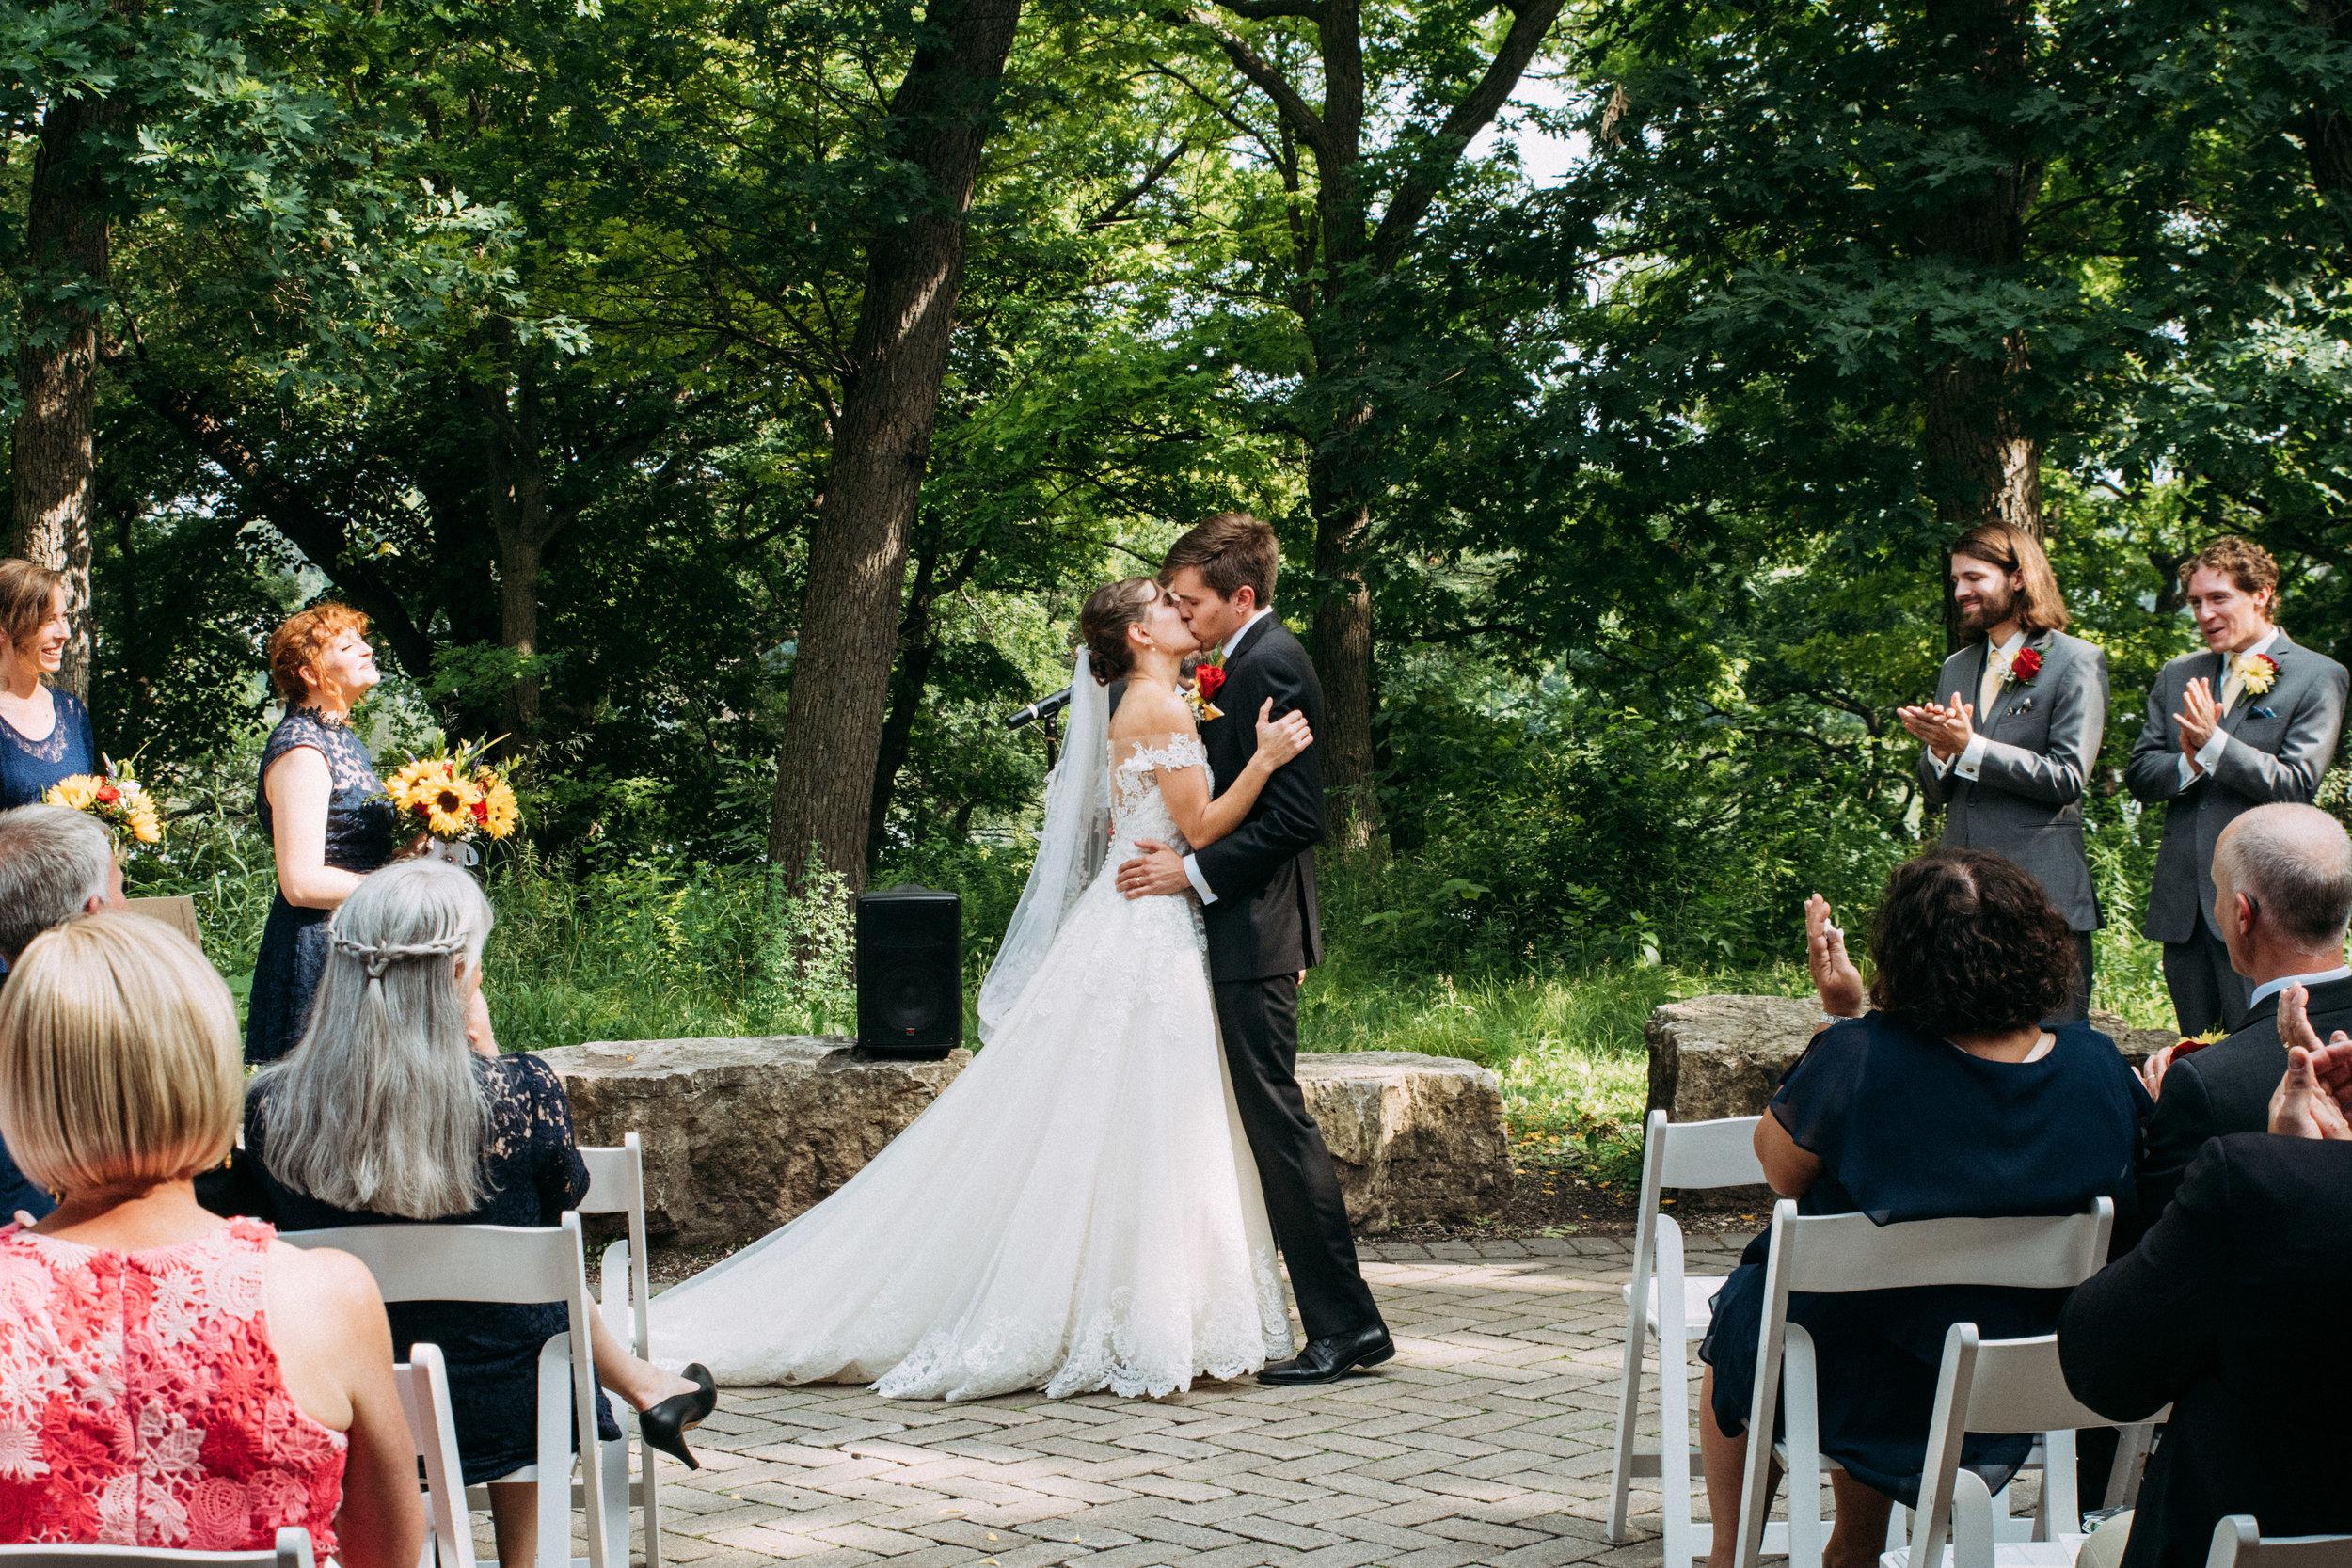 27-Liza_Chris_Minneapolis_Minnesota_Wedding.jpg